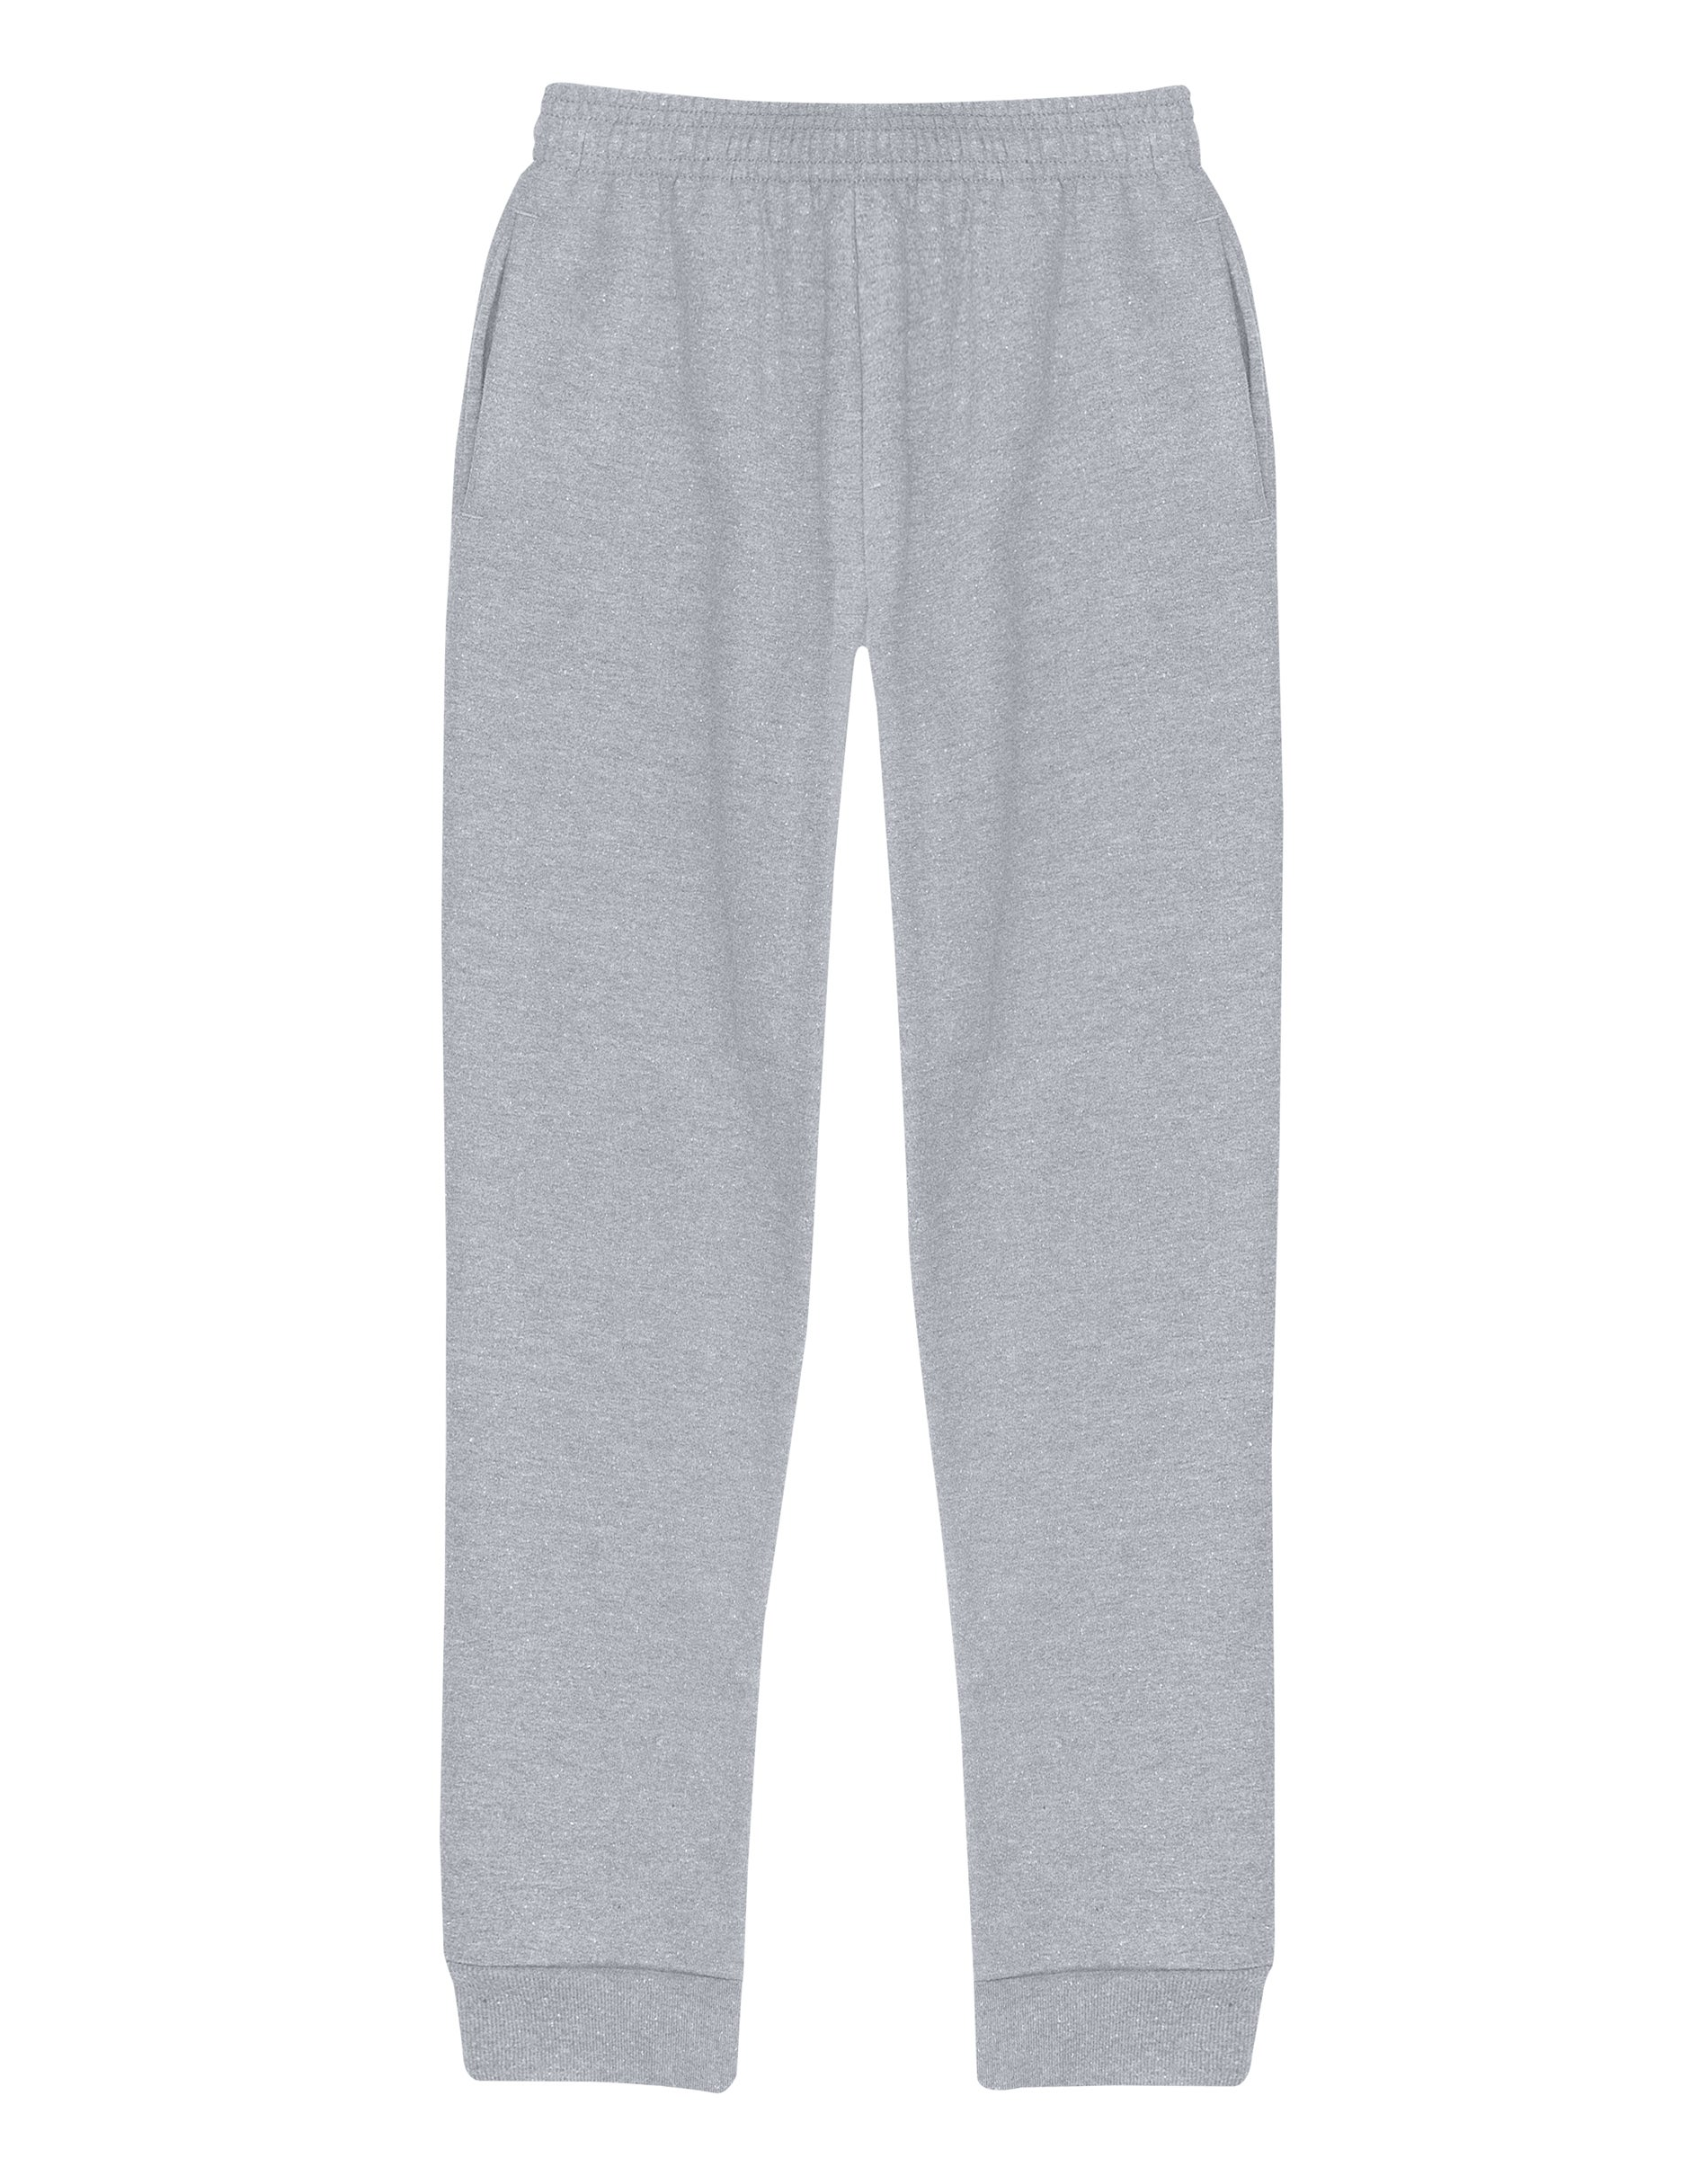 XL OK288 Hanes Girls` ComfortSoft EcoSmart Jogger Sweatpants Black